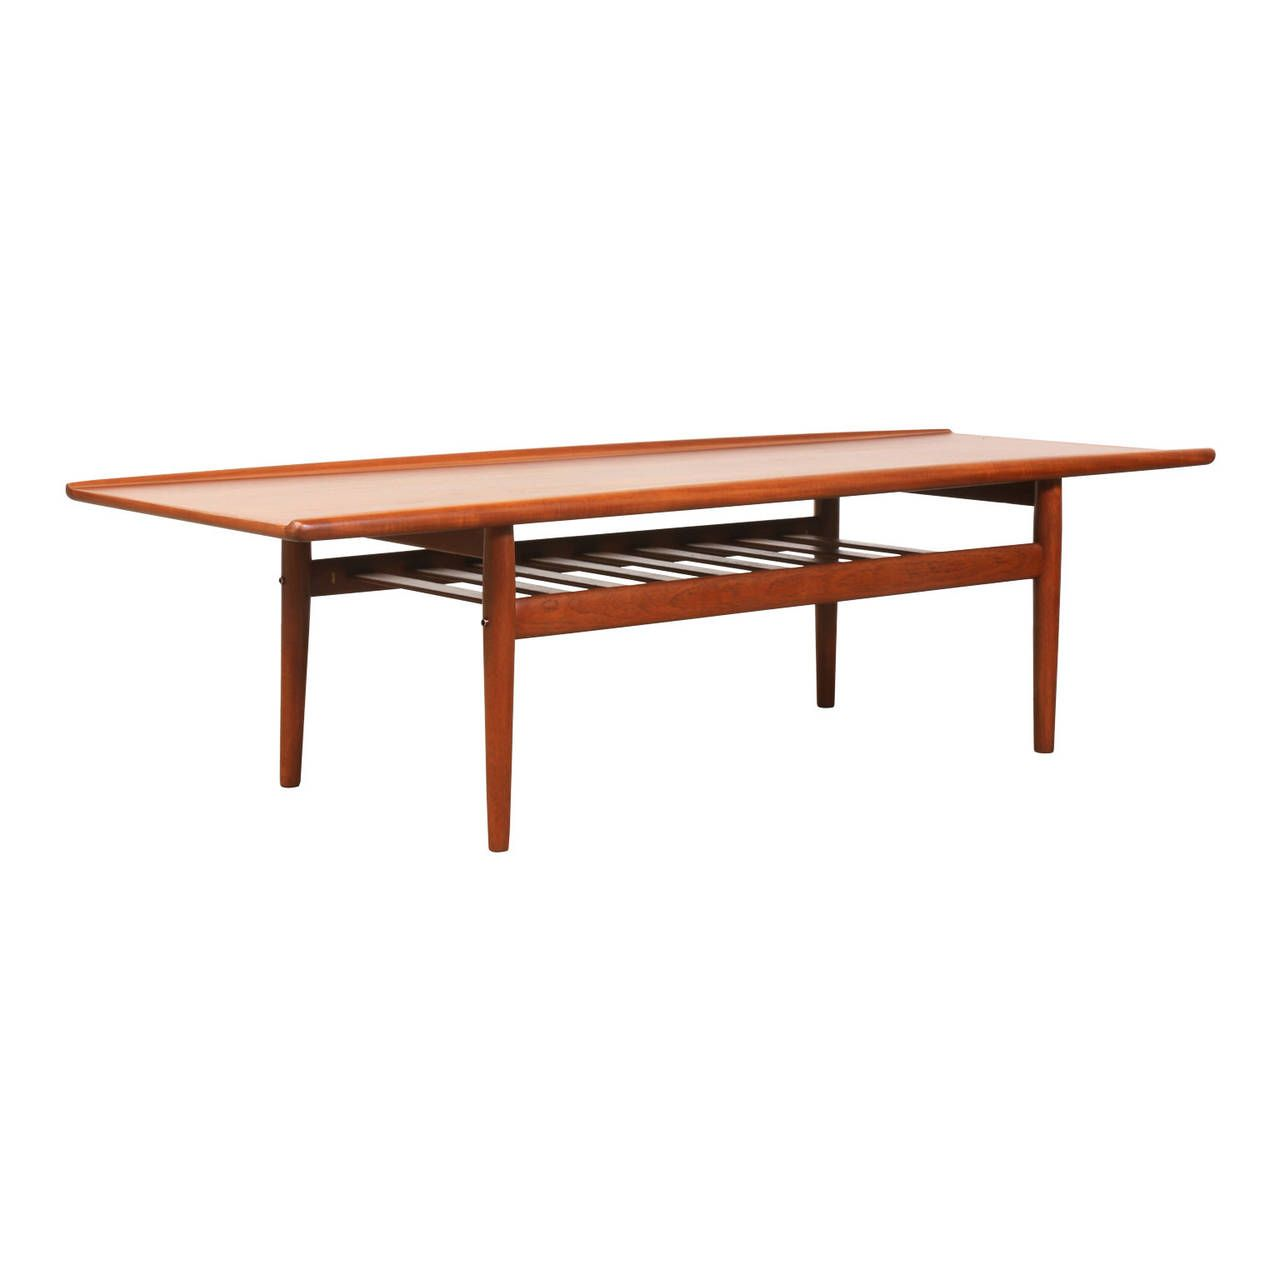 Grete Jalk Teak Coffee Table For Glostrup Mobelfabrik Image 3 Coffee Table Table Teak Coffee Table [ 1280 x 1280 Pixel ]